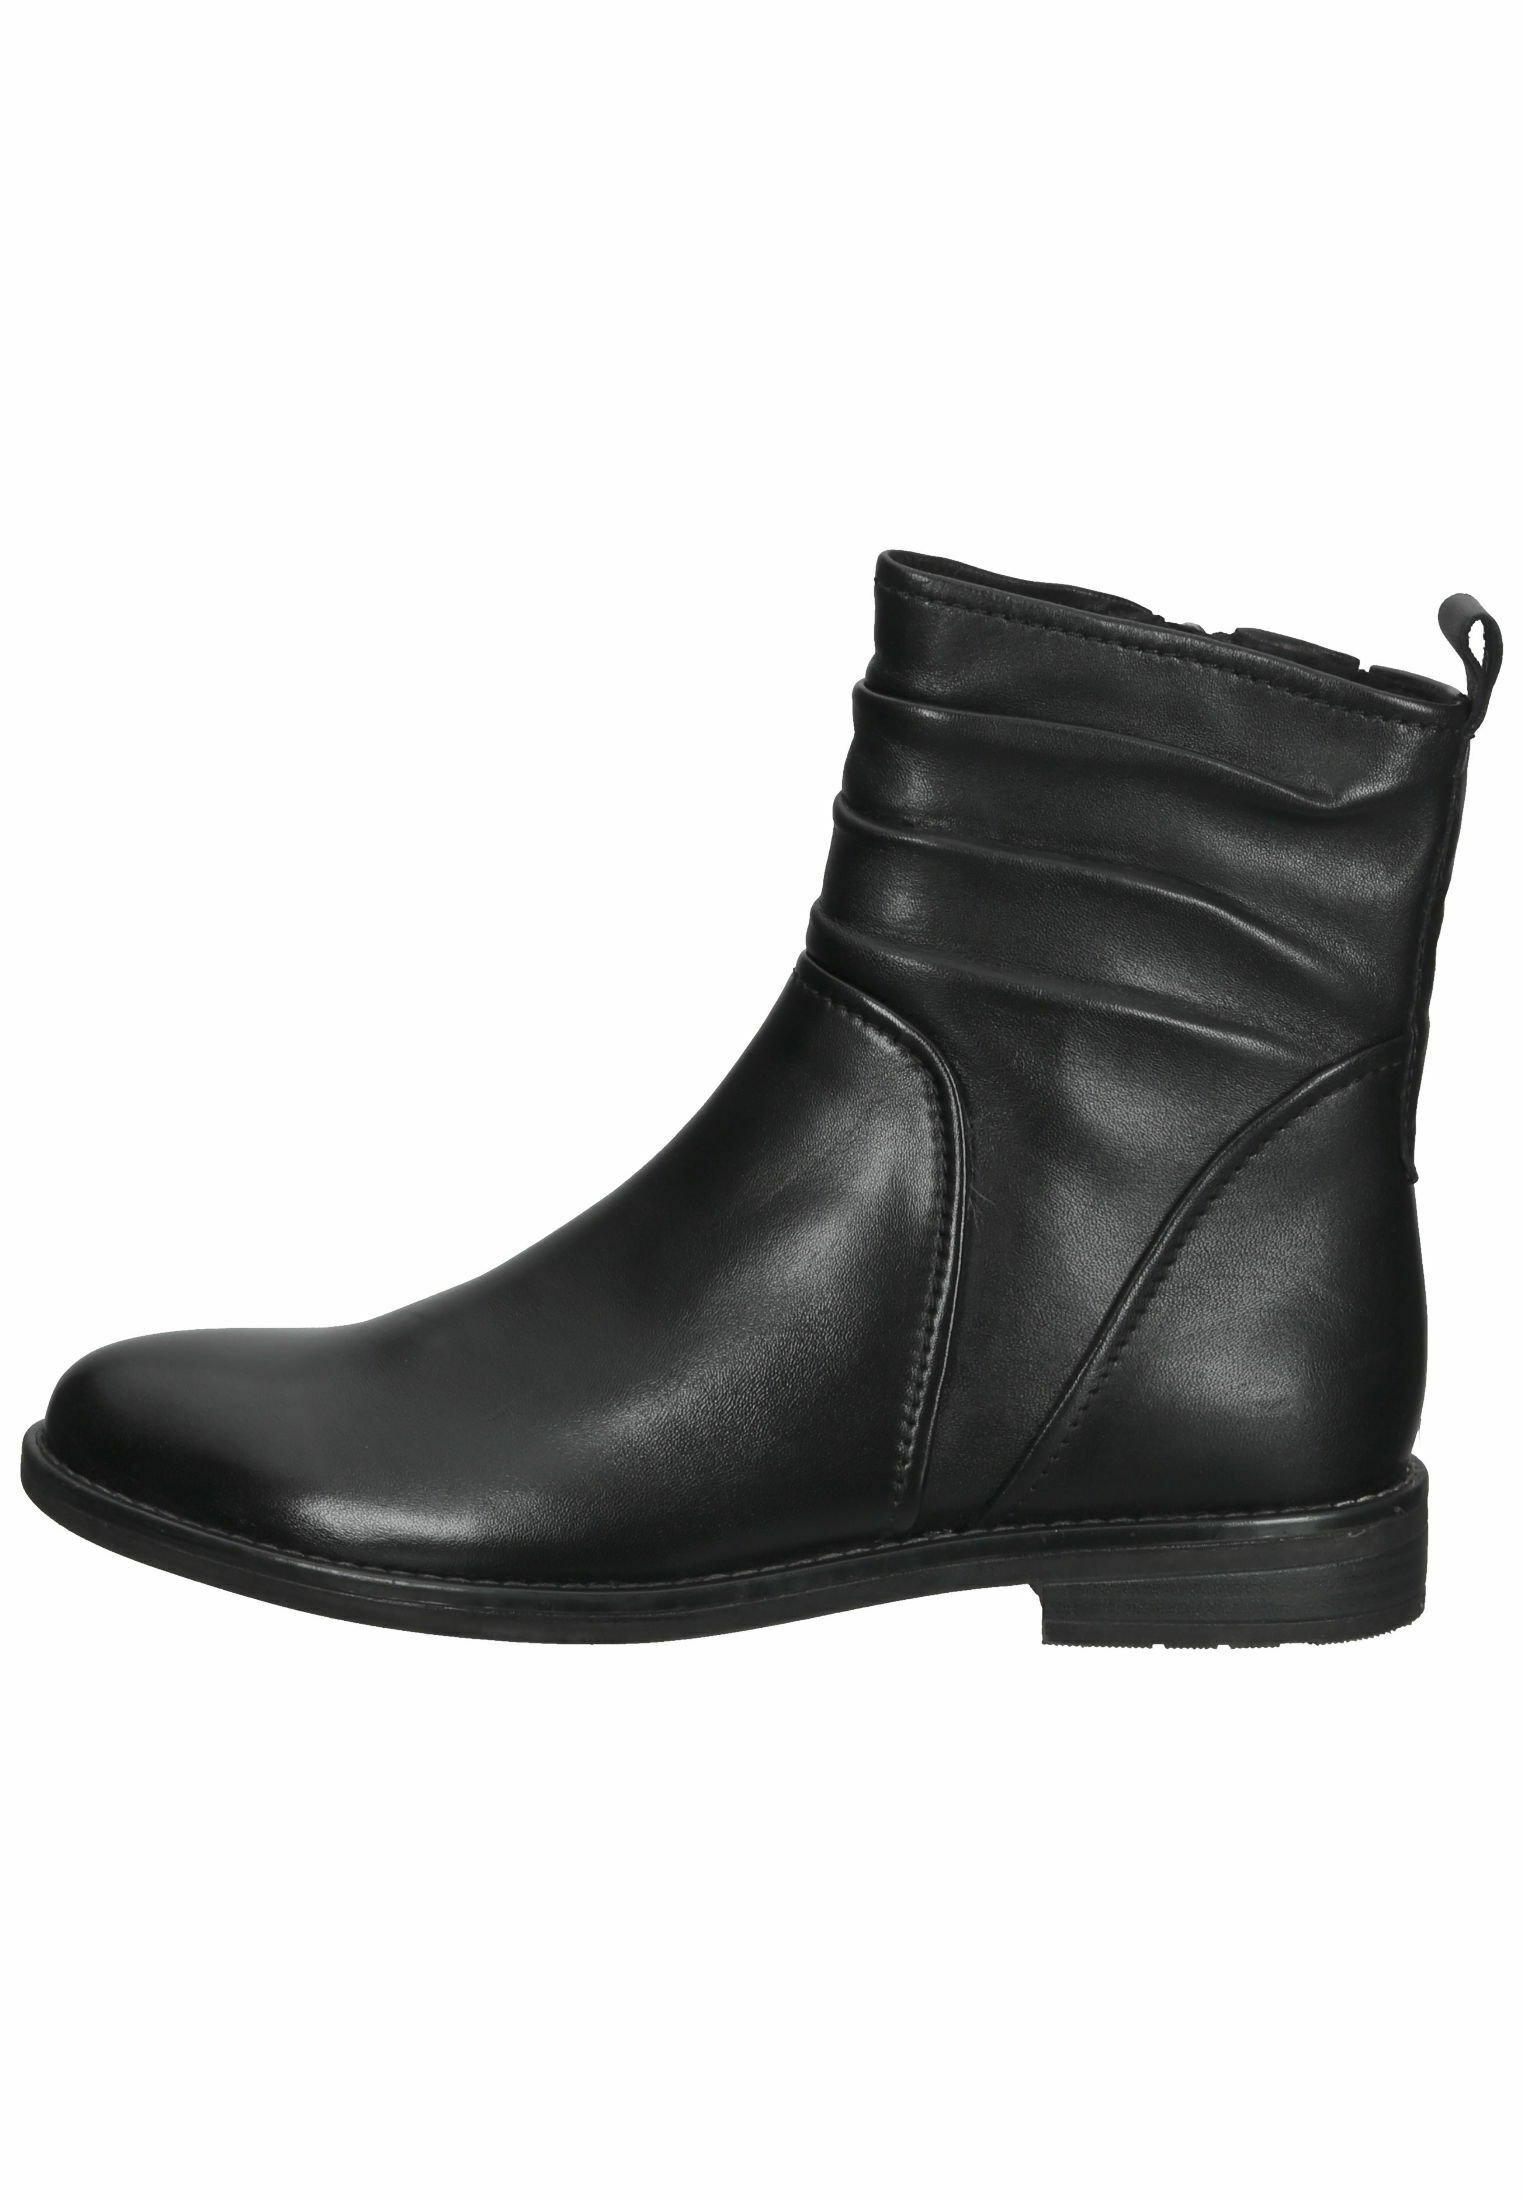 Damen Ankle Boot - black antic